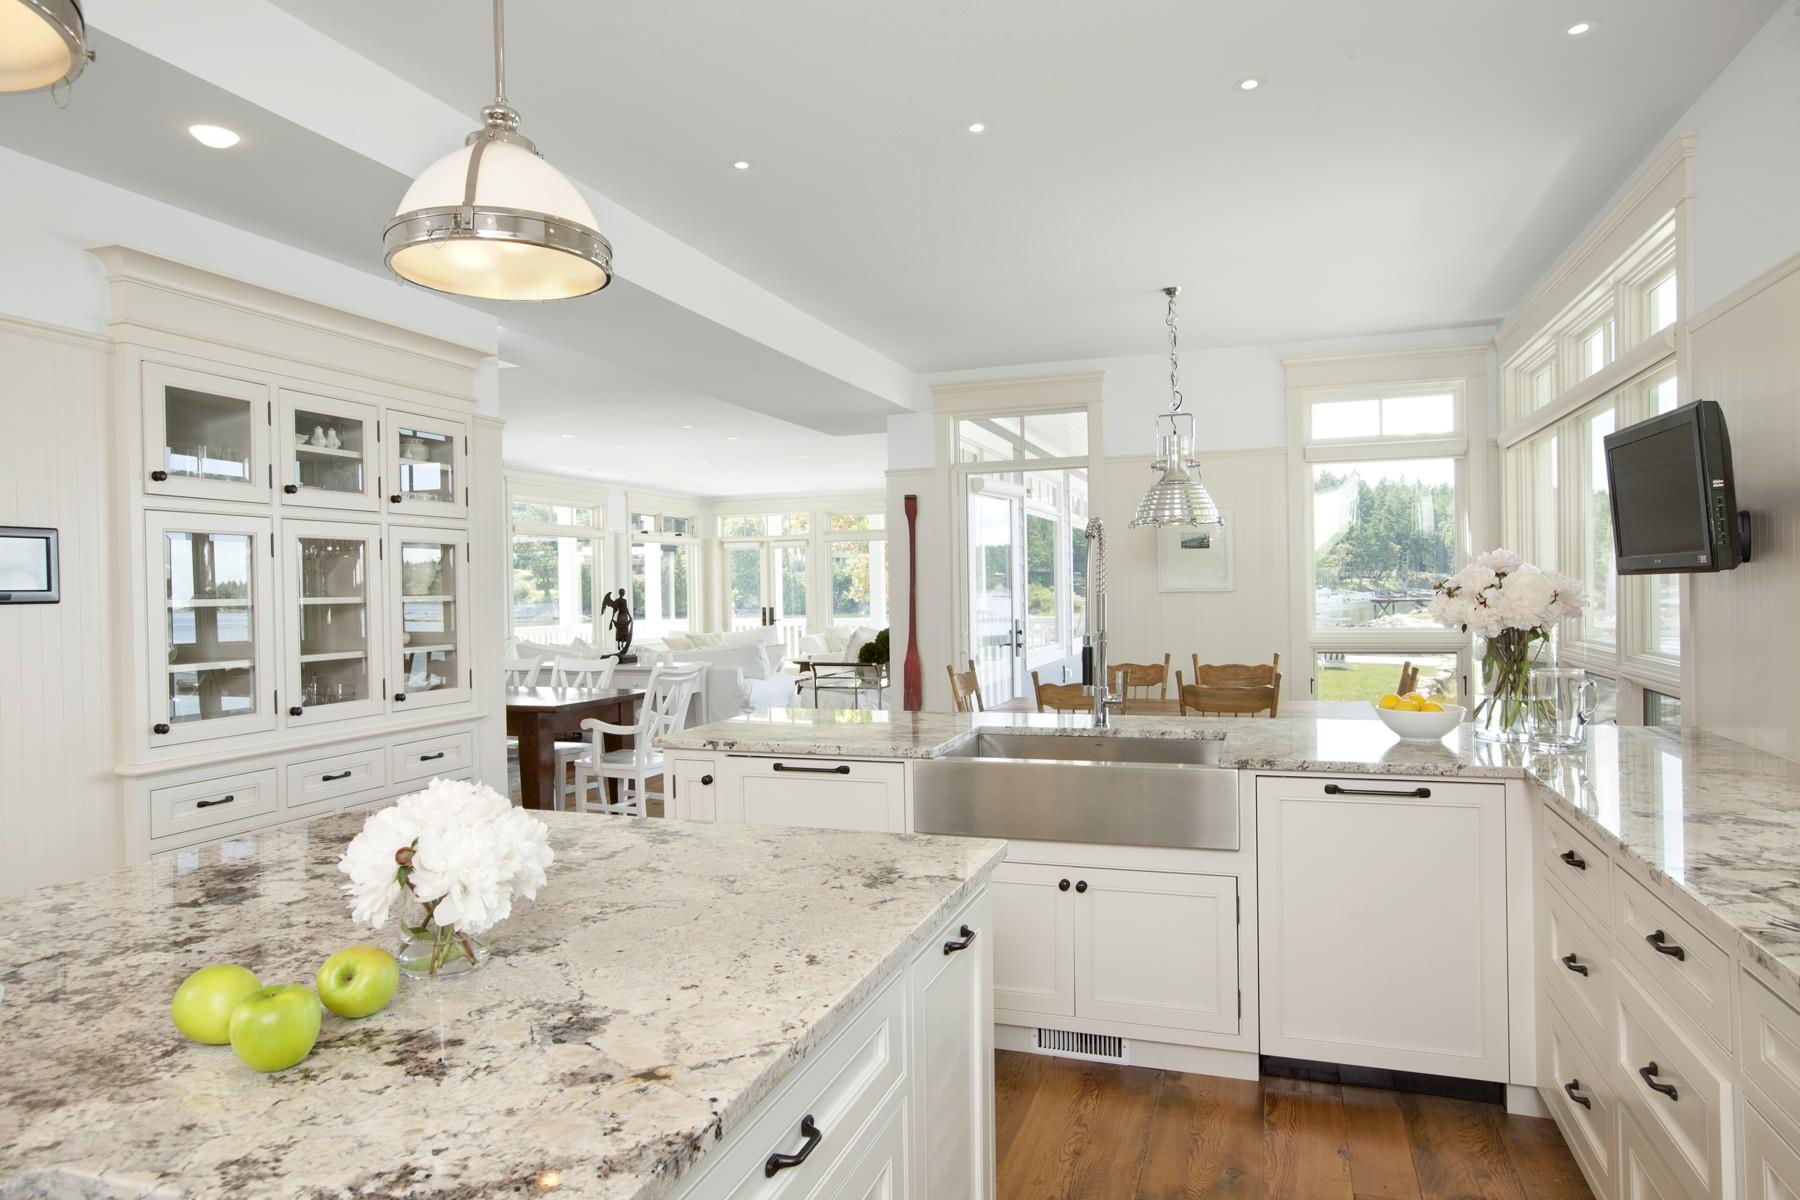 White Kitchen Cabinets Granite Countertops Ideas Photos Houzz